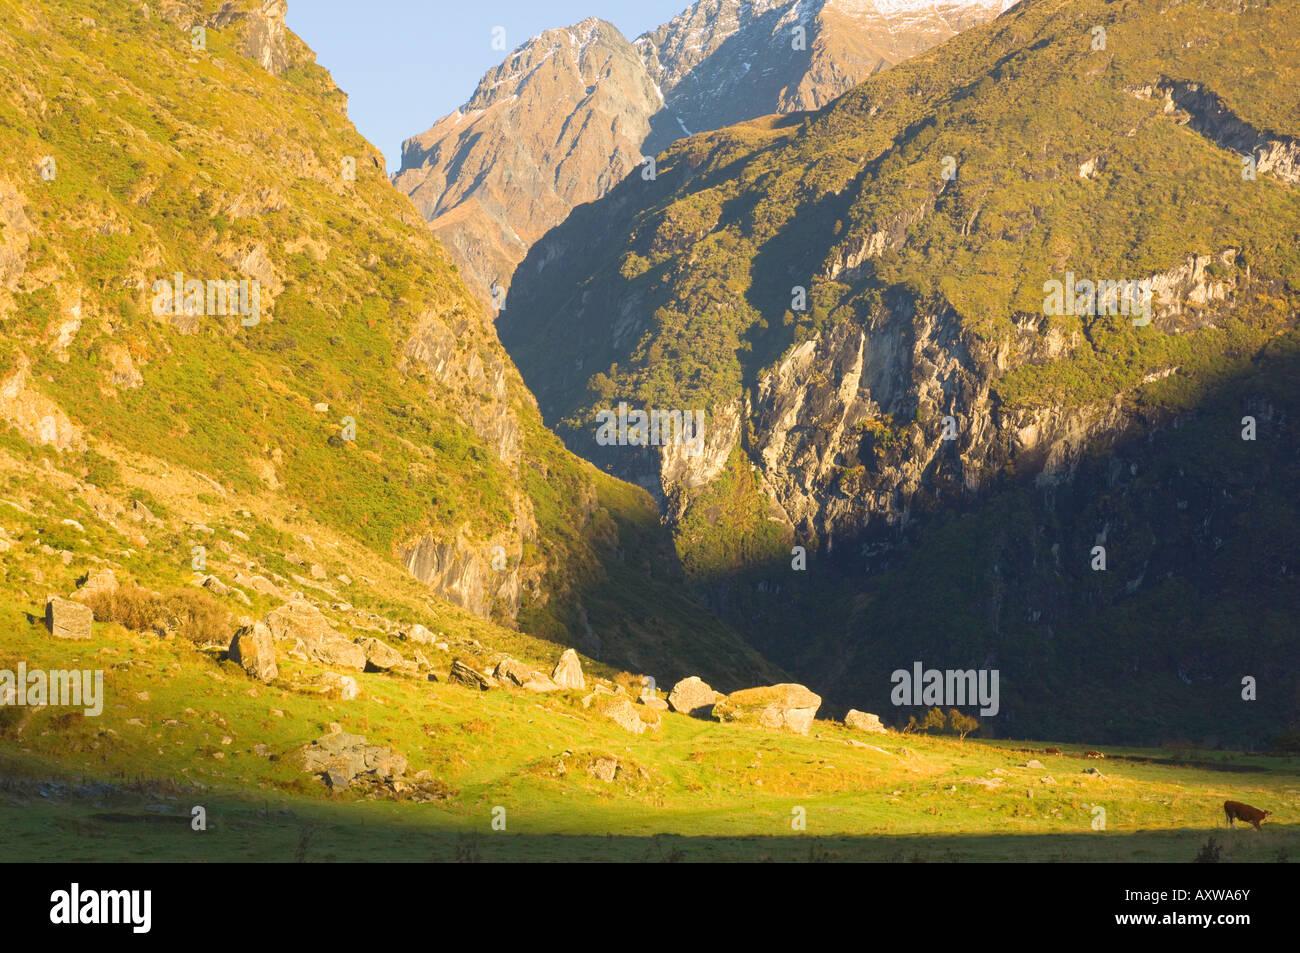 Matukituki Valley, Central Otago, South Island, New Zealand, Pacific - Stock Image